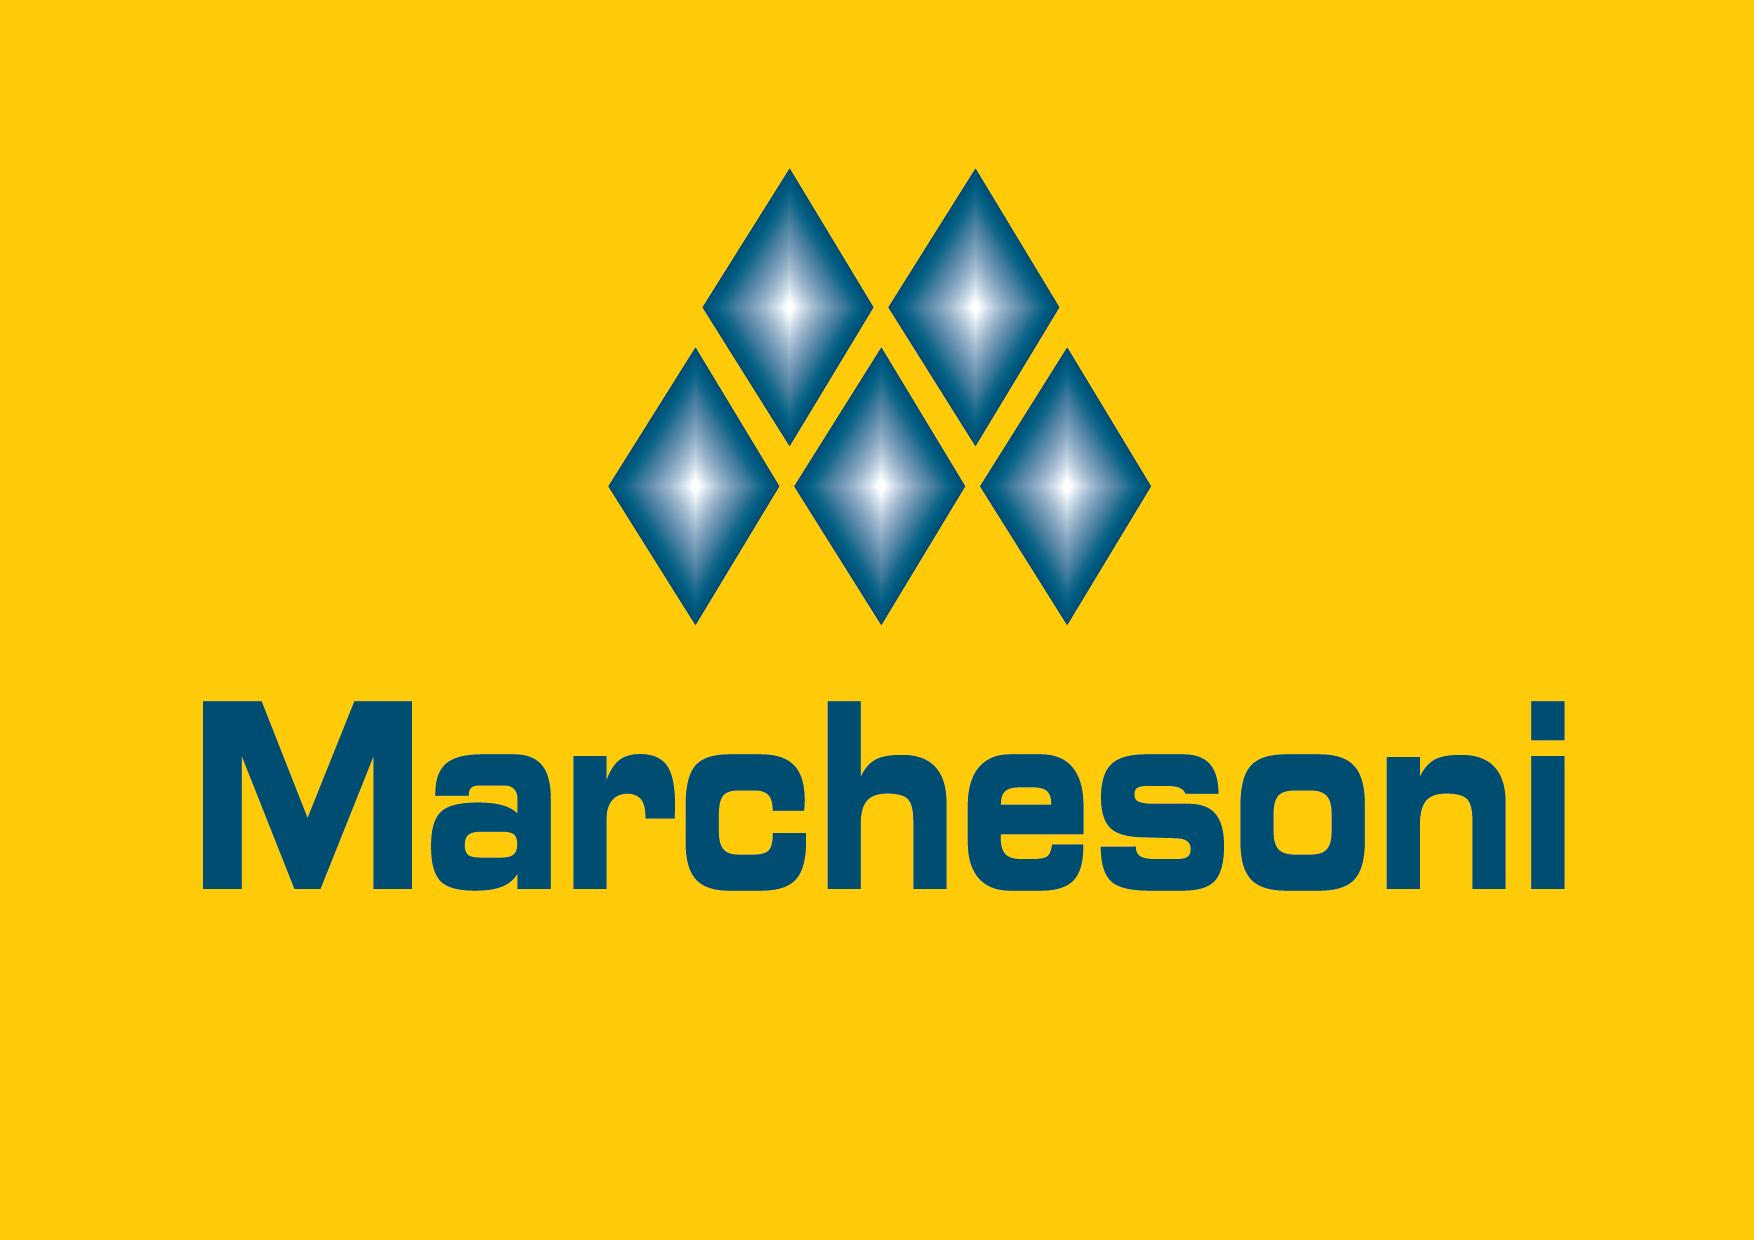 Fritadeira Elétrica Marchesoni 12 litros - FT1621/622  - Carmel Equipamentos